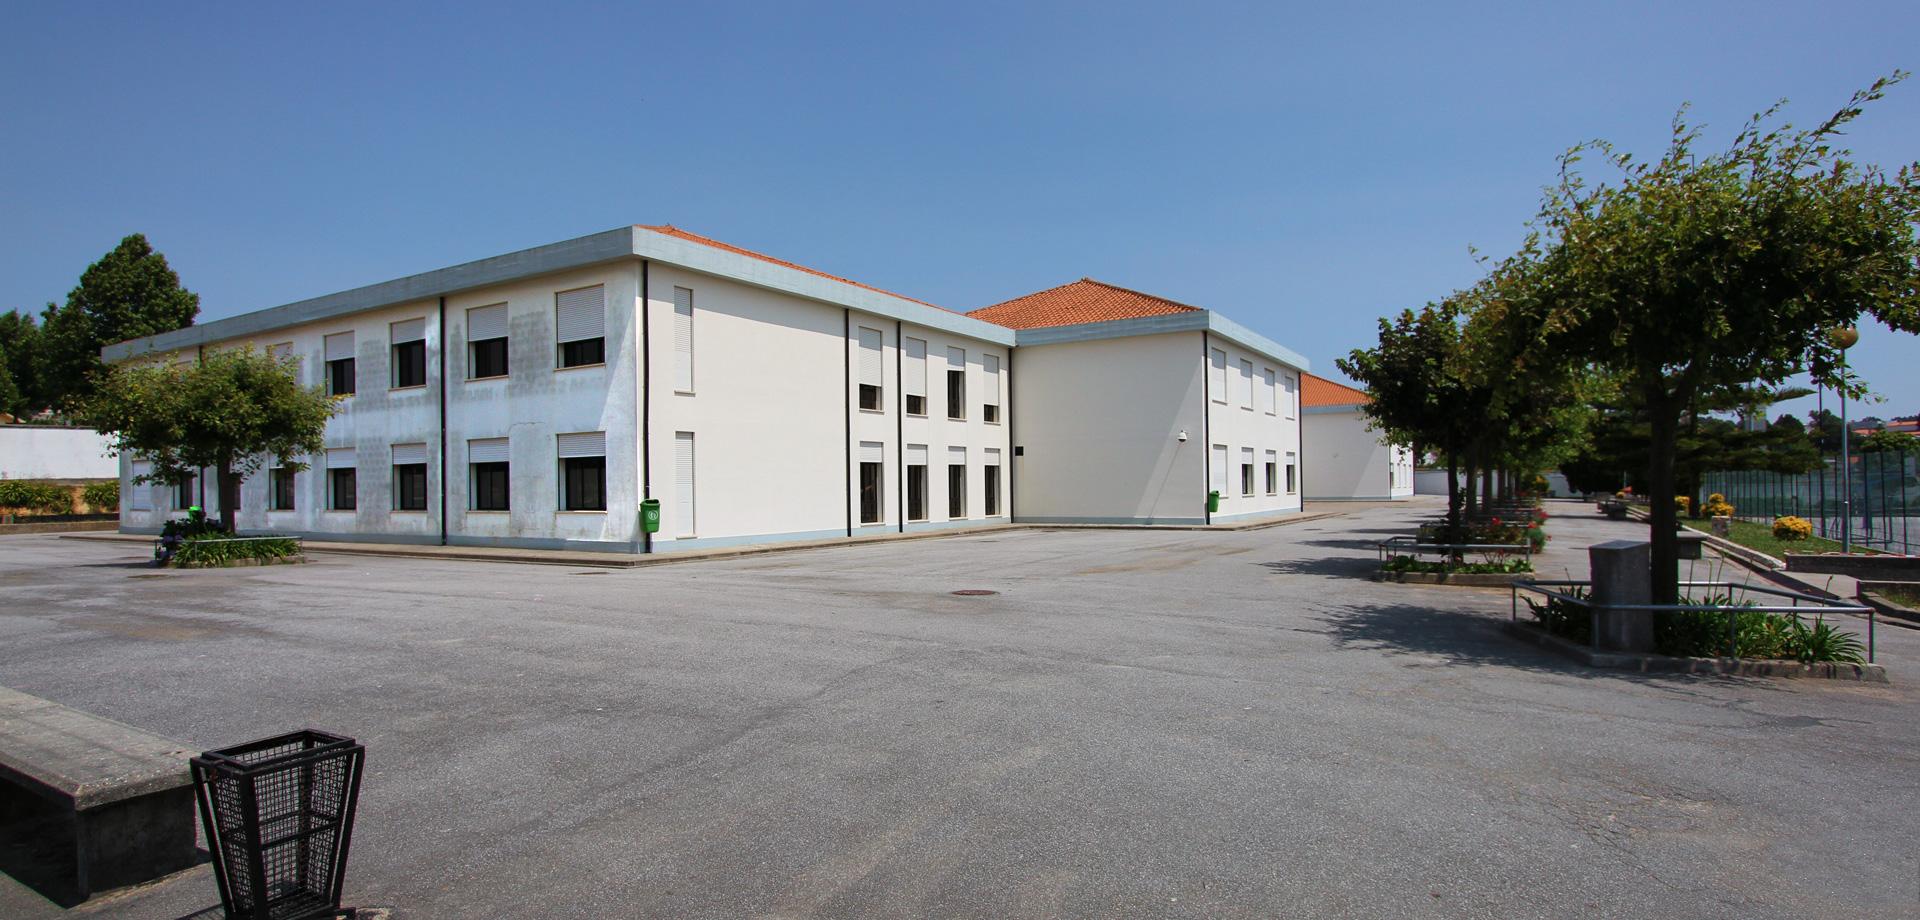 Escola Básica Júlio Dinis – Grijó